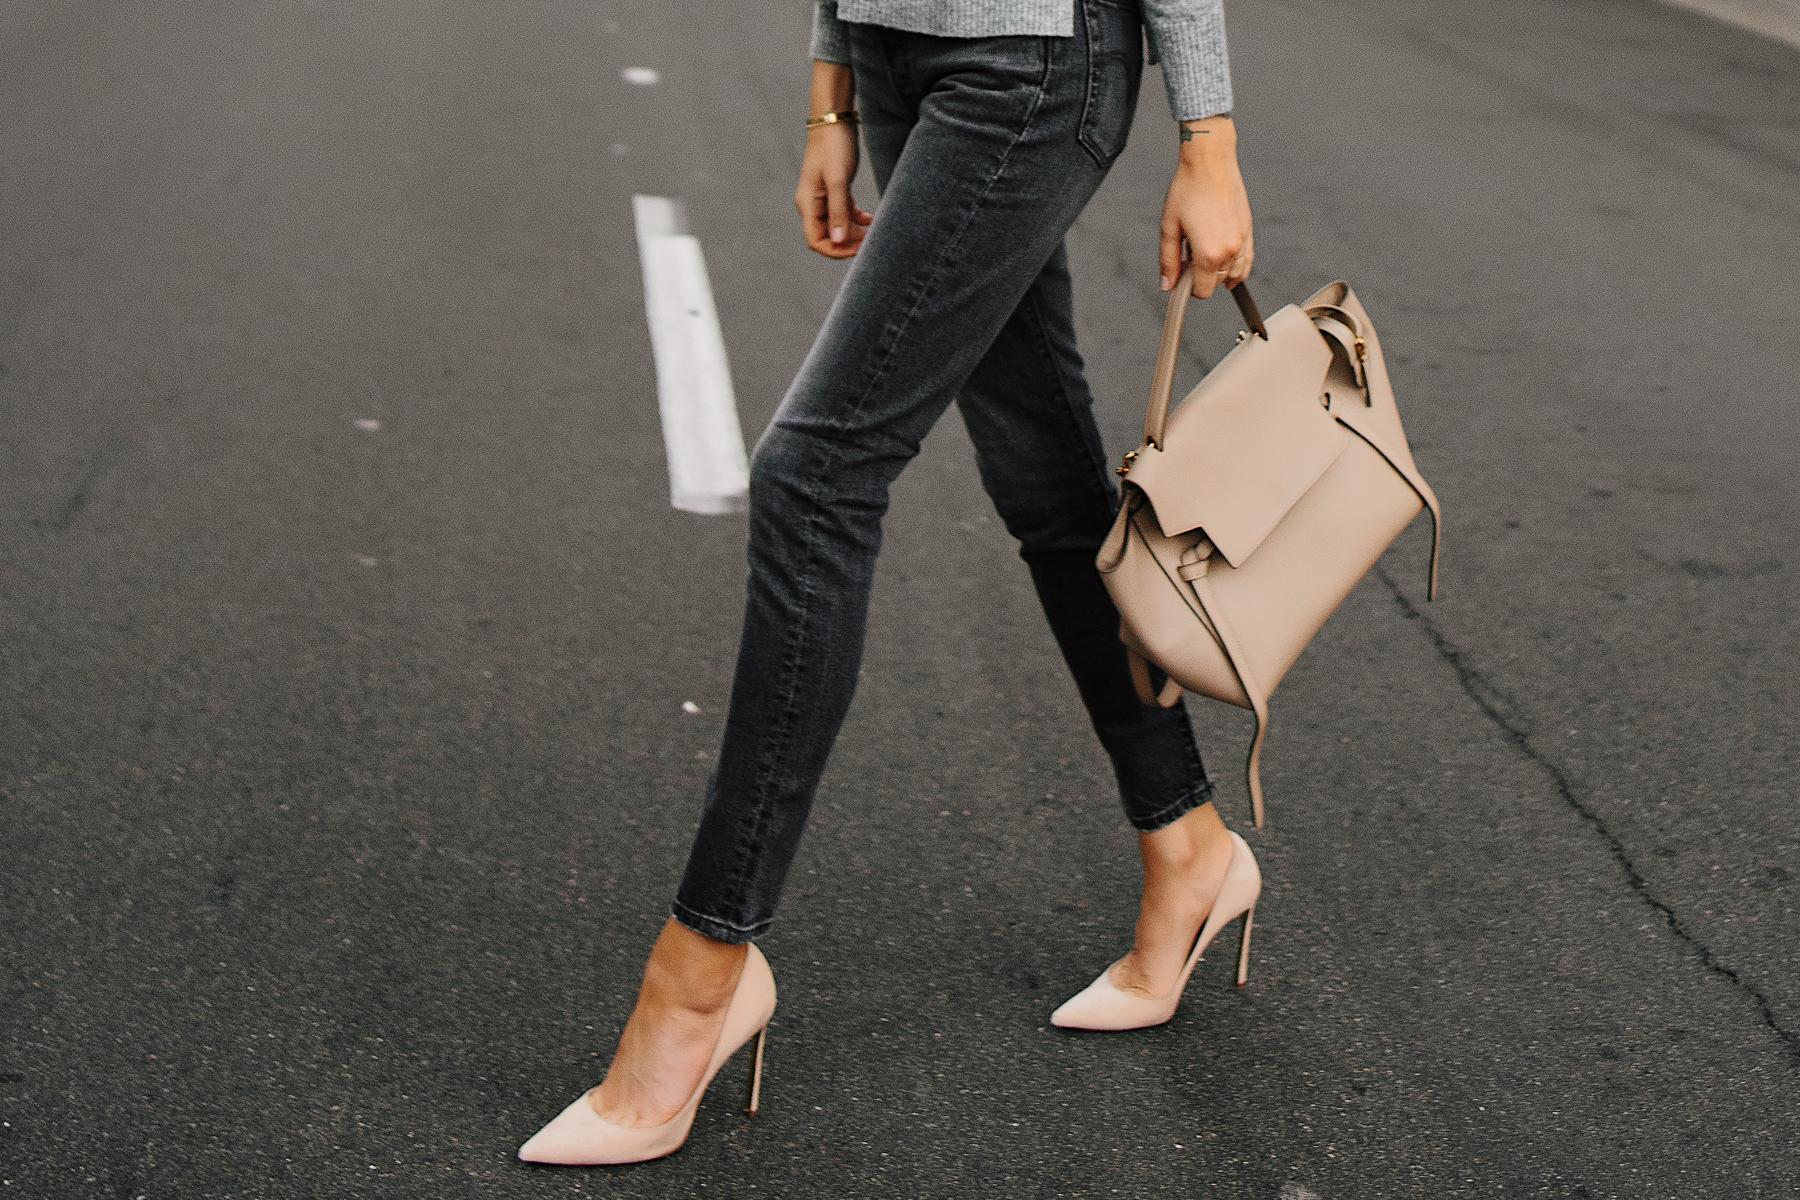 Woman Wearing Levis 501 Grey High Waist Skinny Jeans Tan Pumps Celine Mini Belt Bag Fashion Jackson San Diego Fashion Blogger Street Style